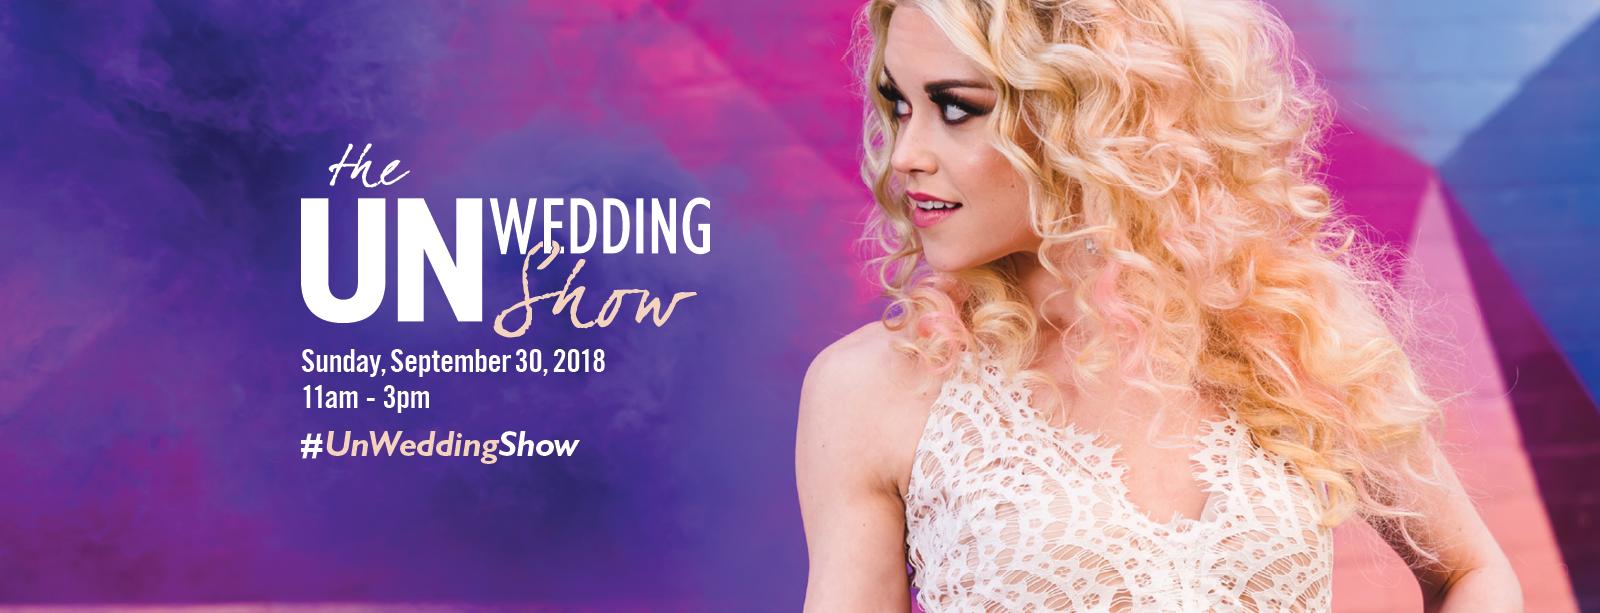 The Unwedding Show